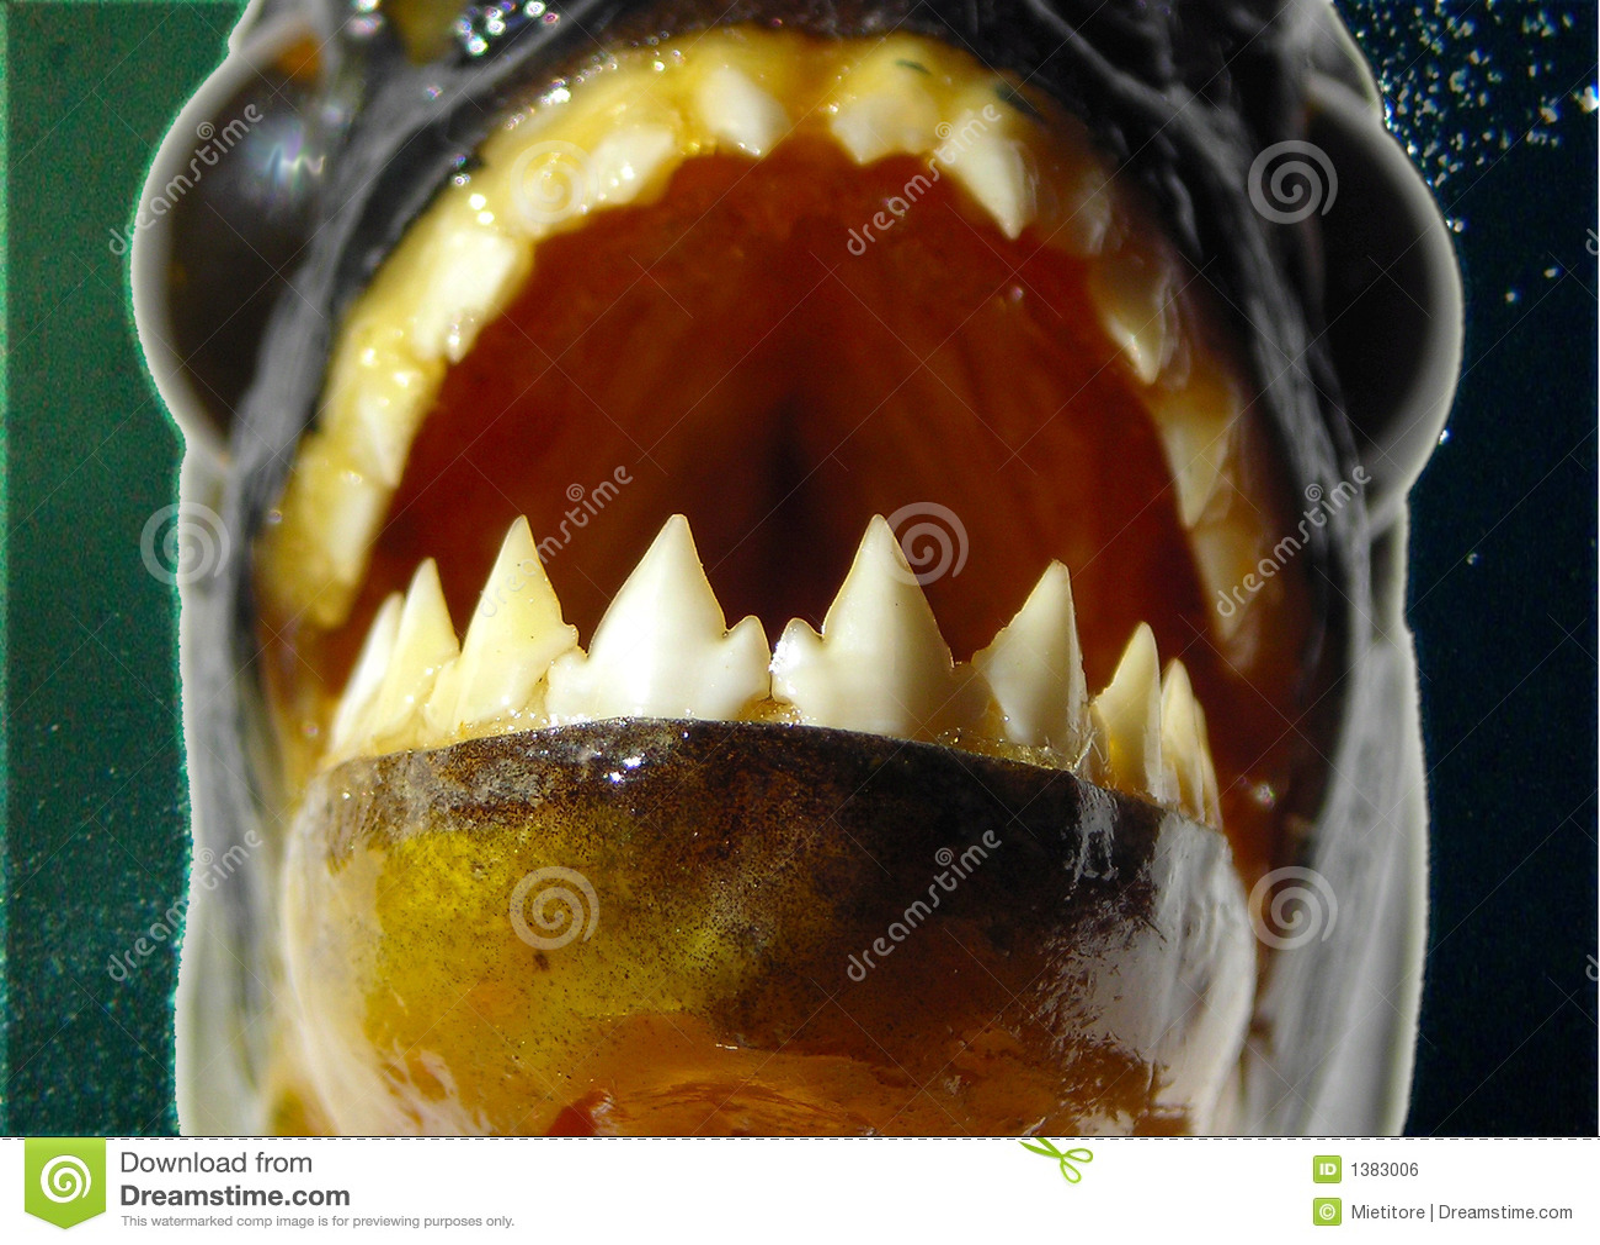 Piranha - Teeth Closeup Royalty Free Stock Image - Image: 1383006